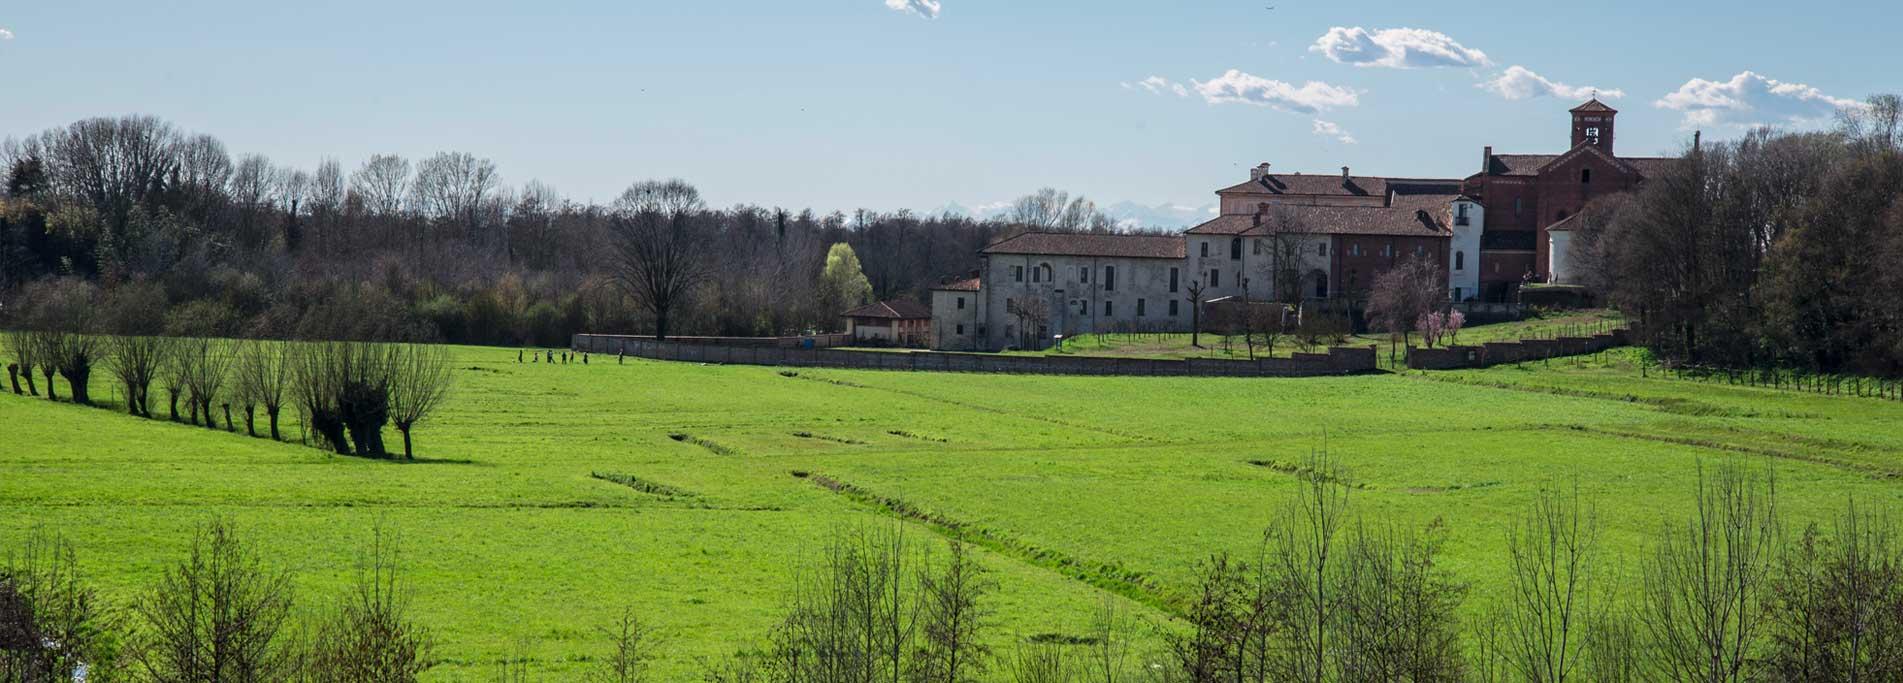 Sentieri Antichi a Morimondo